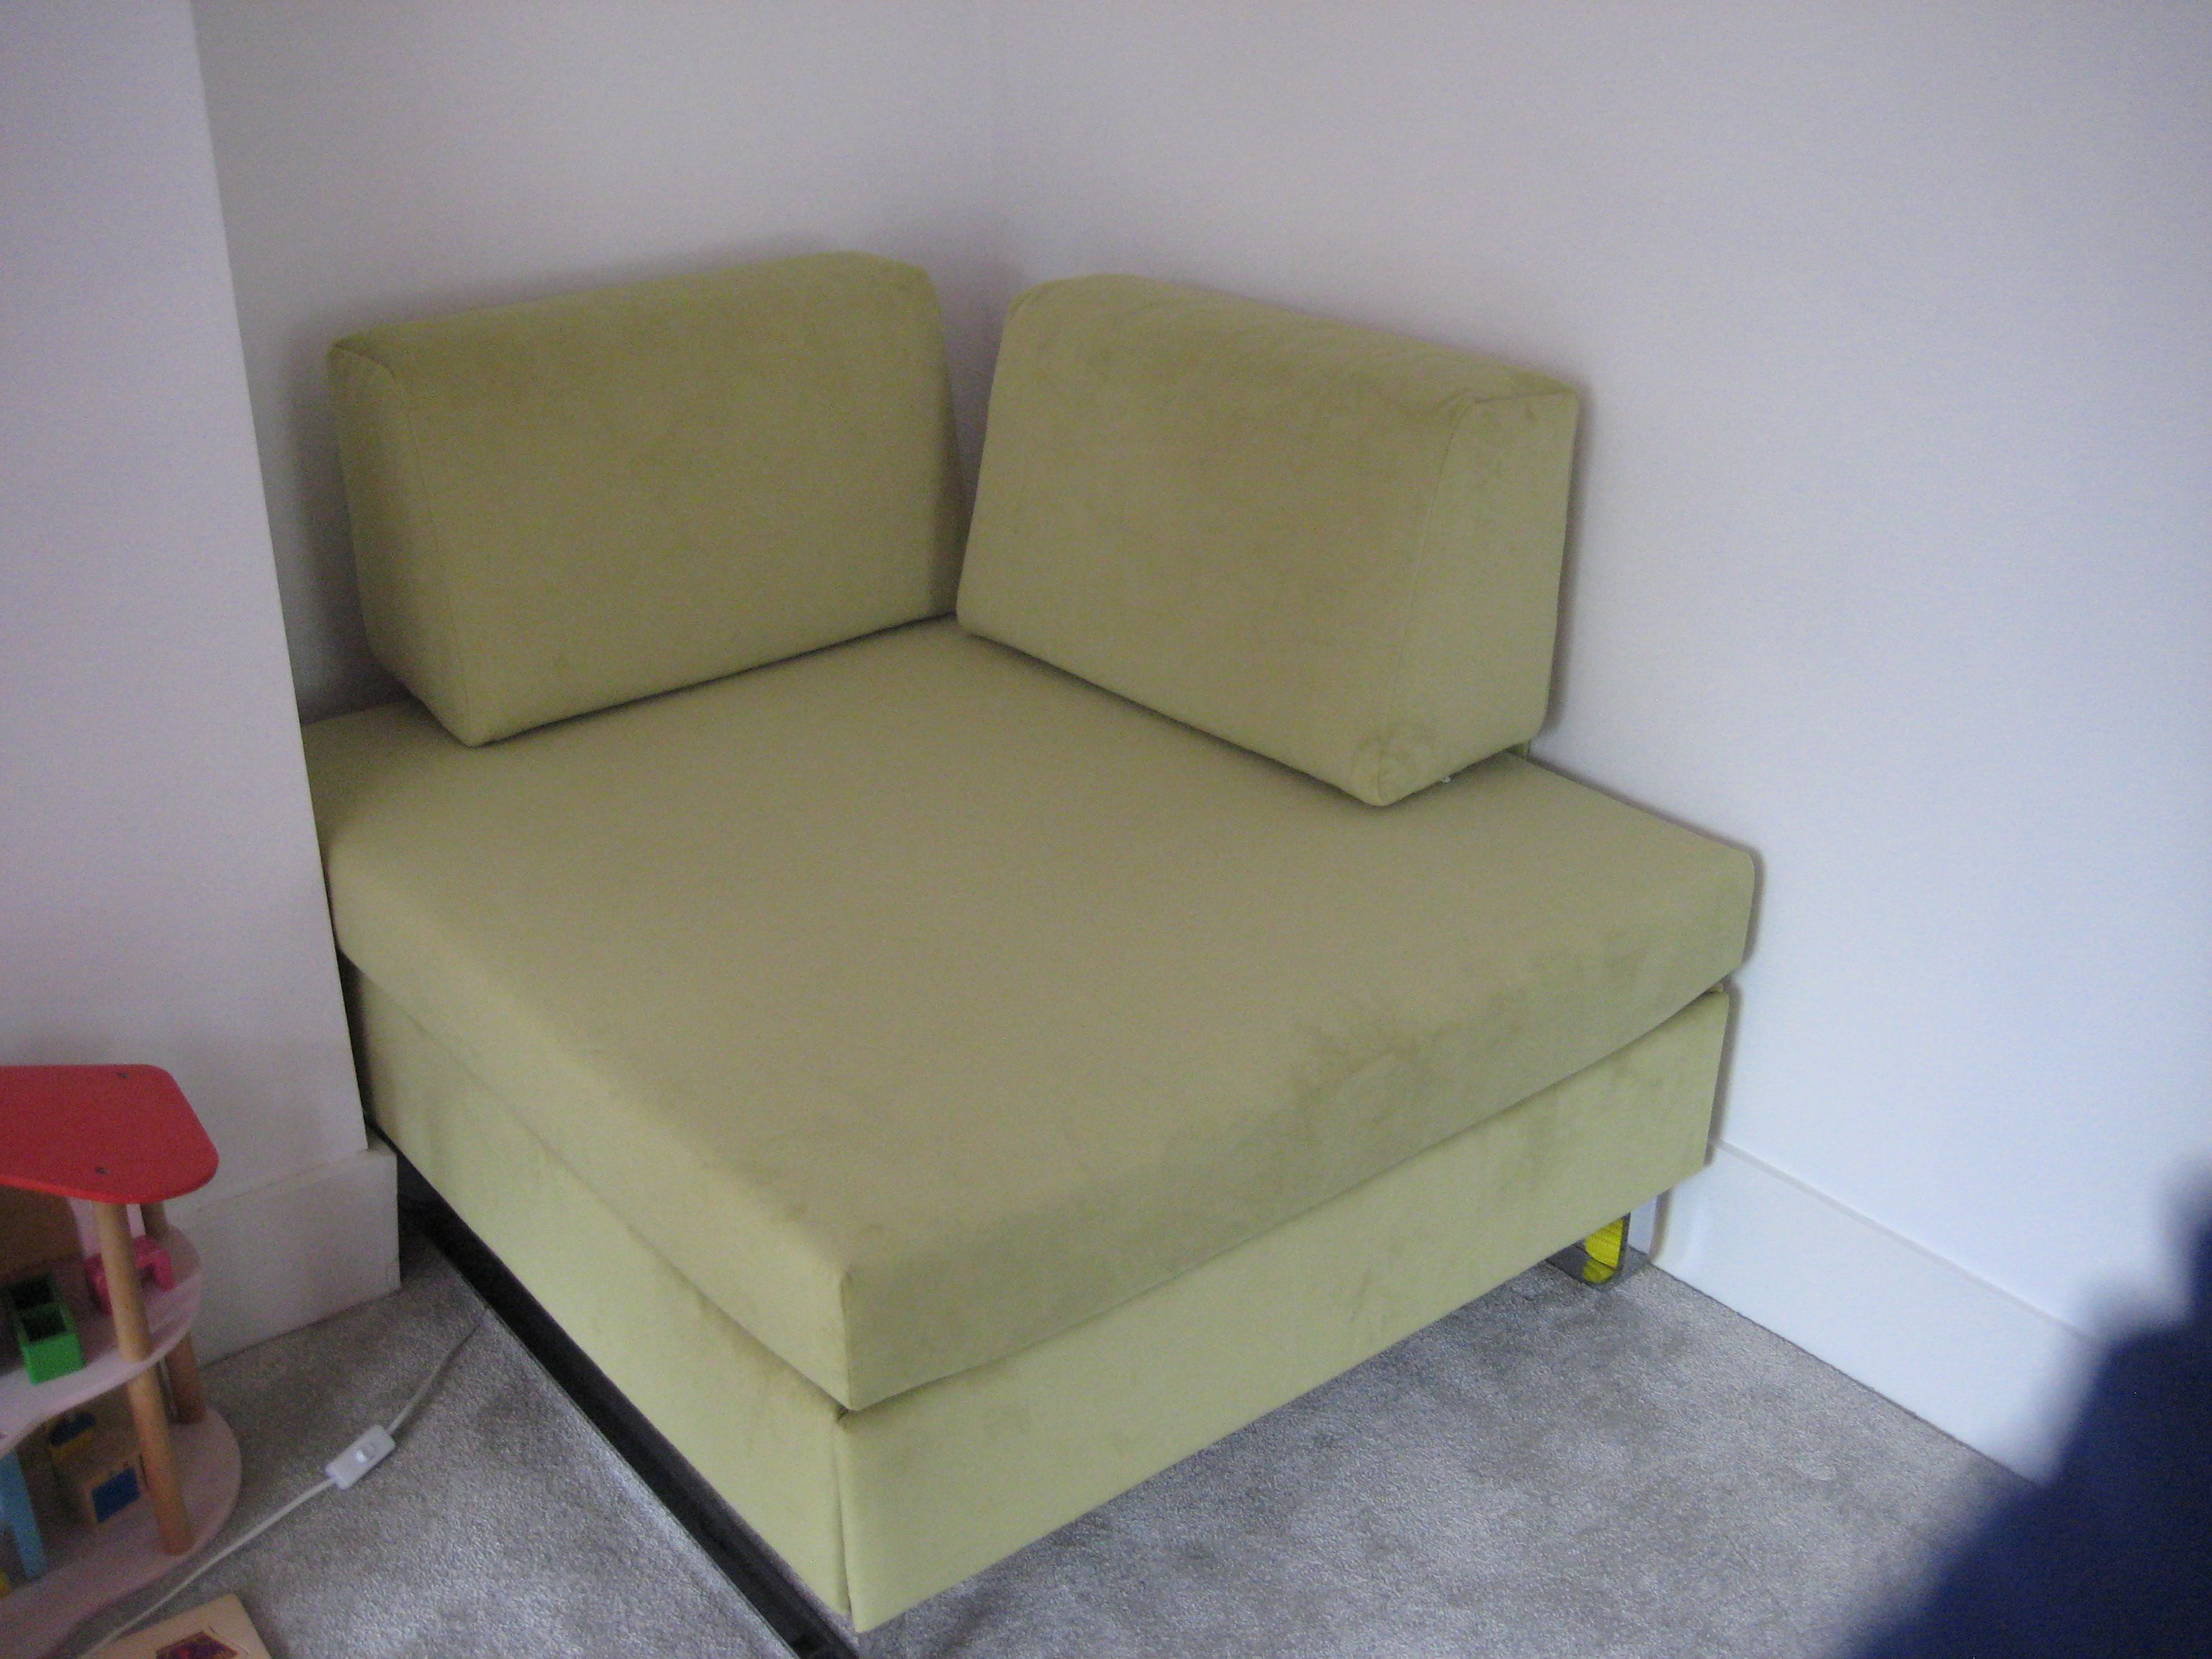 Hocker arm chair / single luxury sofa bed in Linwood Moleskin velvet -  chiff chaff.